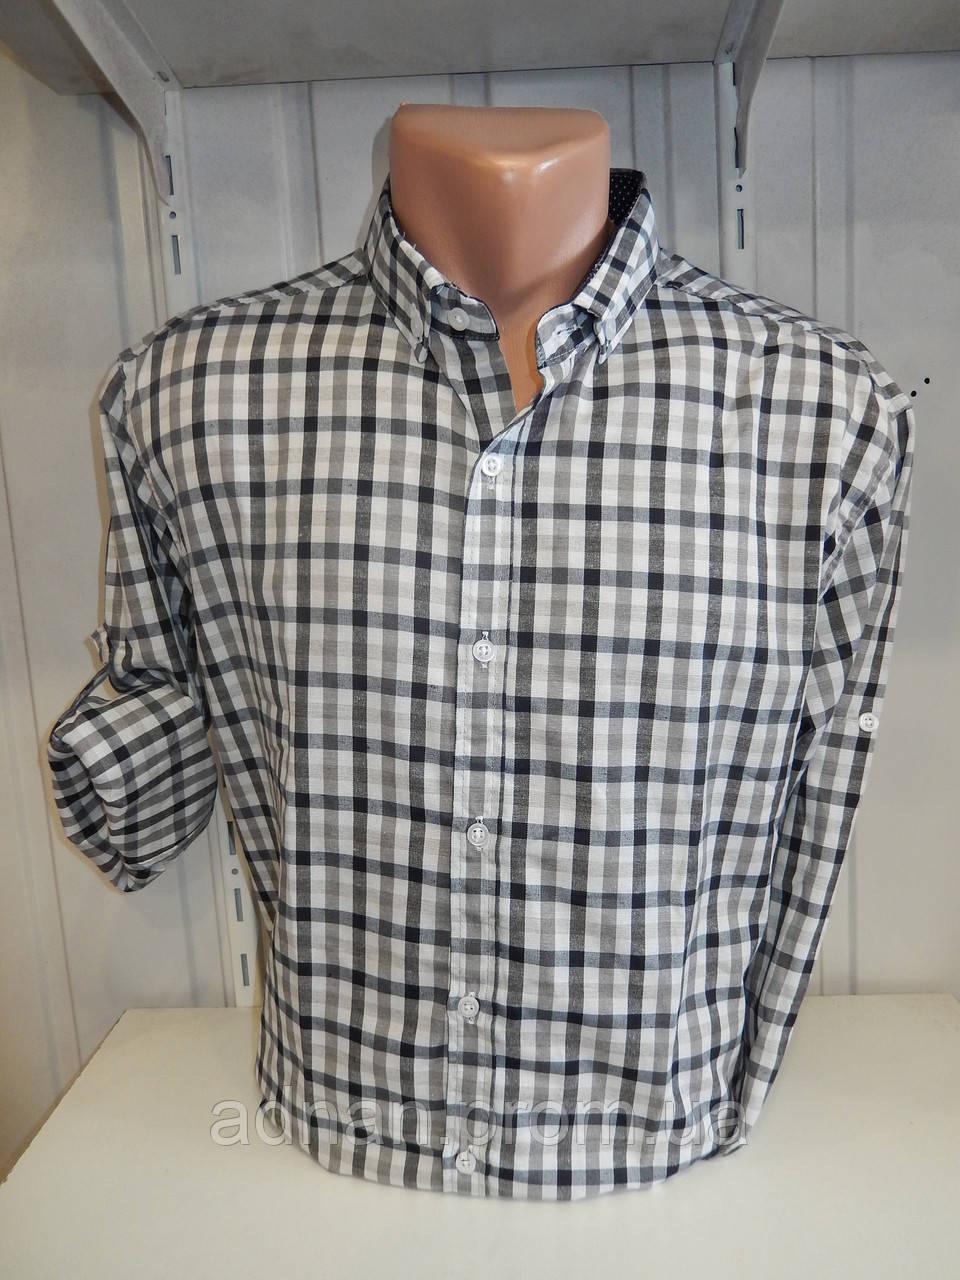 Рубашка мужская ALBERTO MALDINI  длинный-короткий рукав, средняя клетка, комб. 001\ купить рубашку